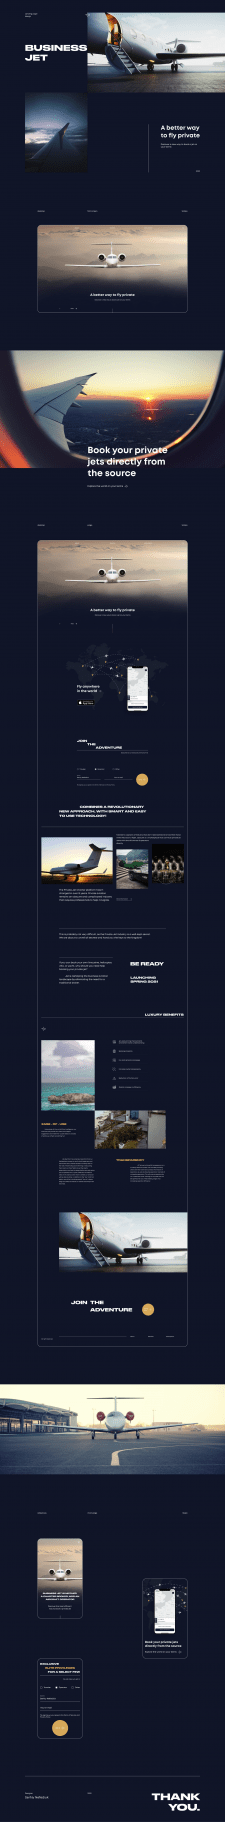 Opes Jet - landing page design